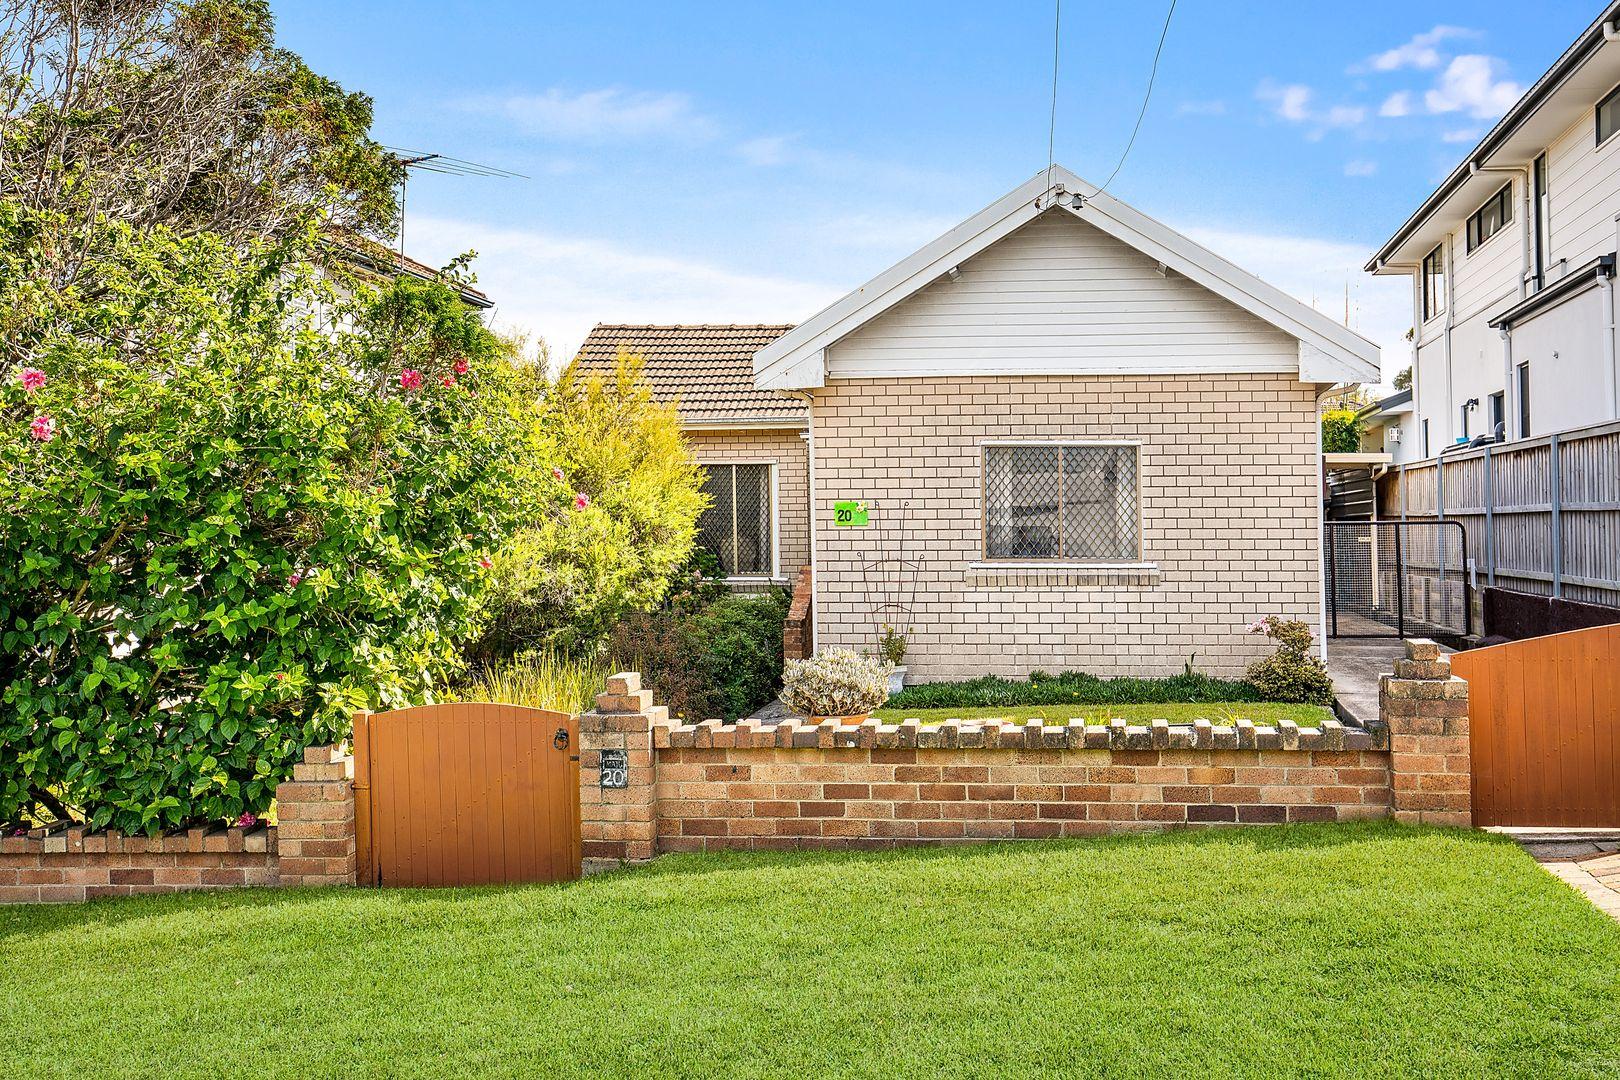 20 David Road, Collaroy Plateau NSW 2097, Image 0